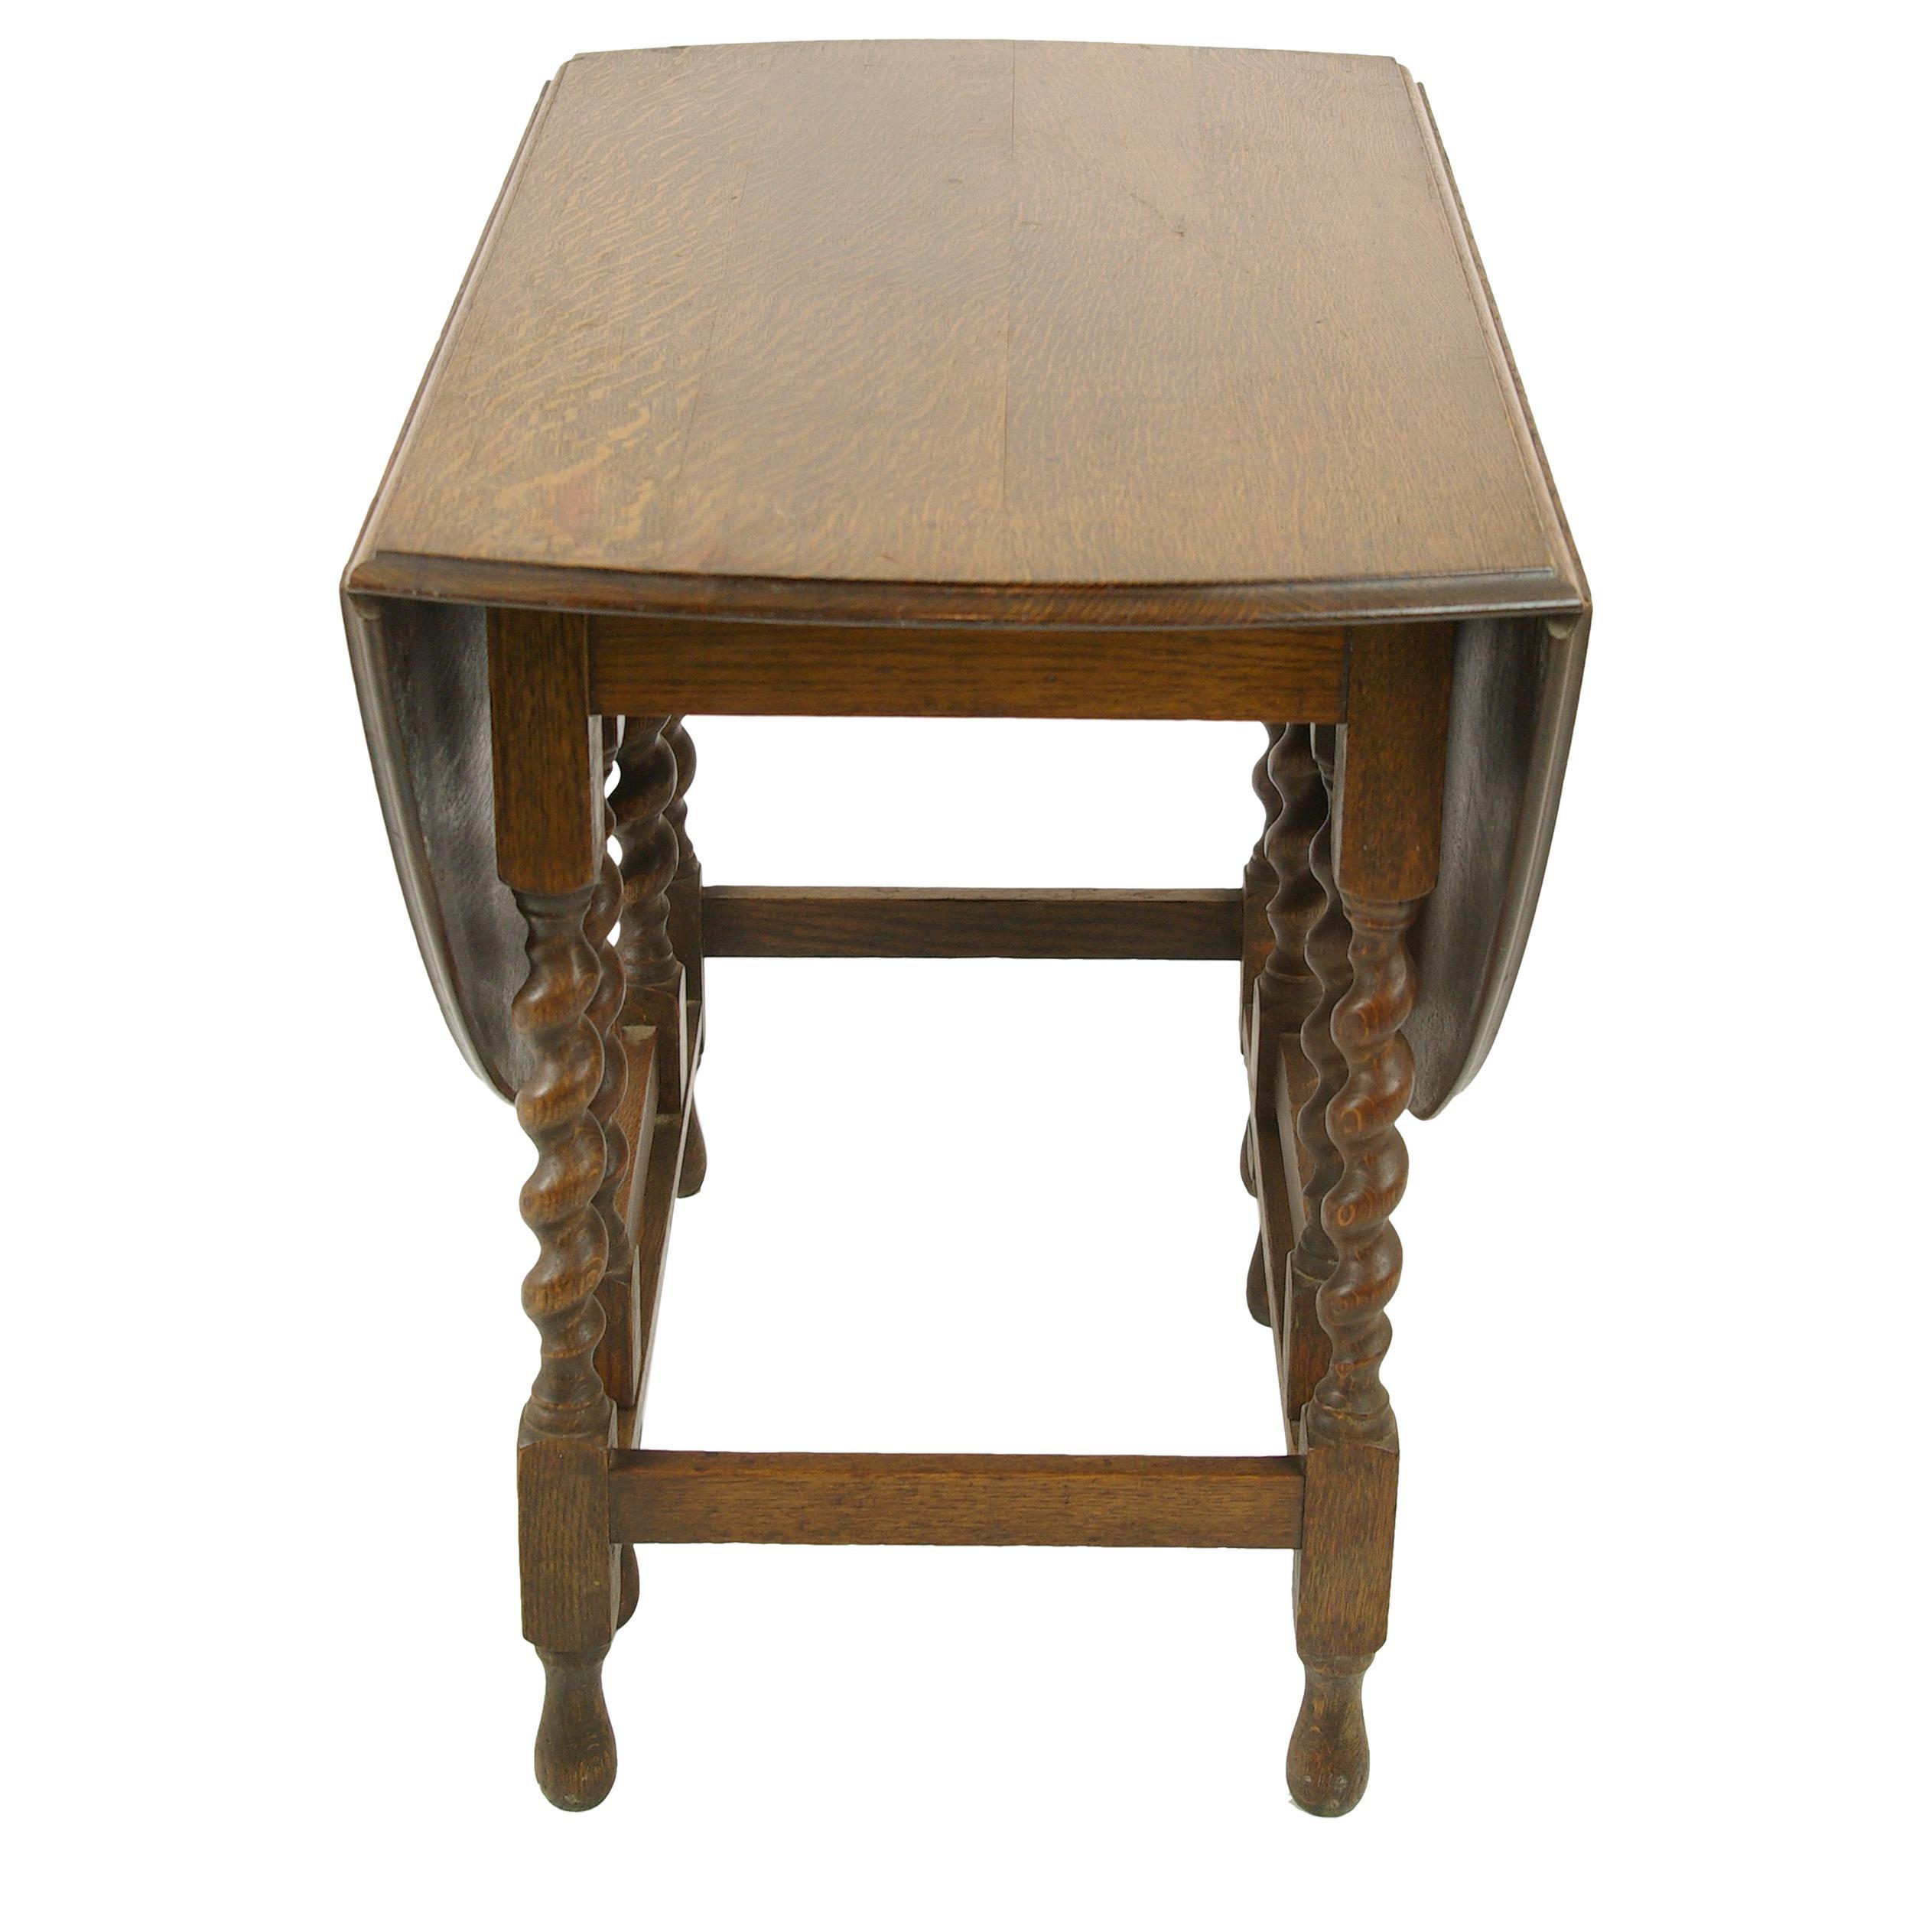 Antique Gateleg Table, Oak Barley Twist Oval Drop Leaf Table, B1418 For Sale